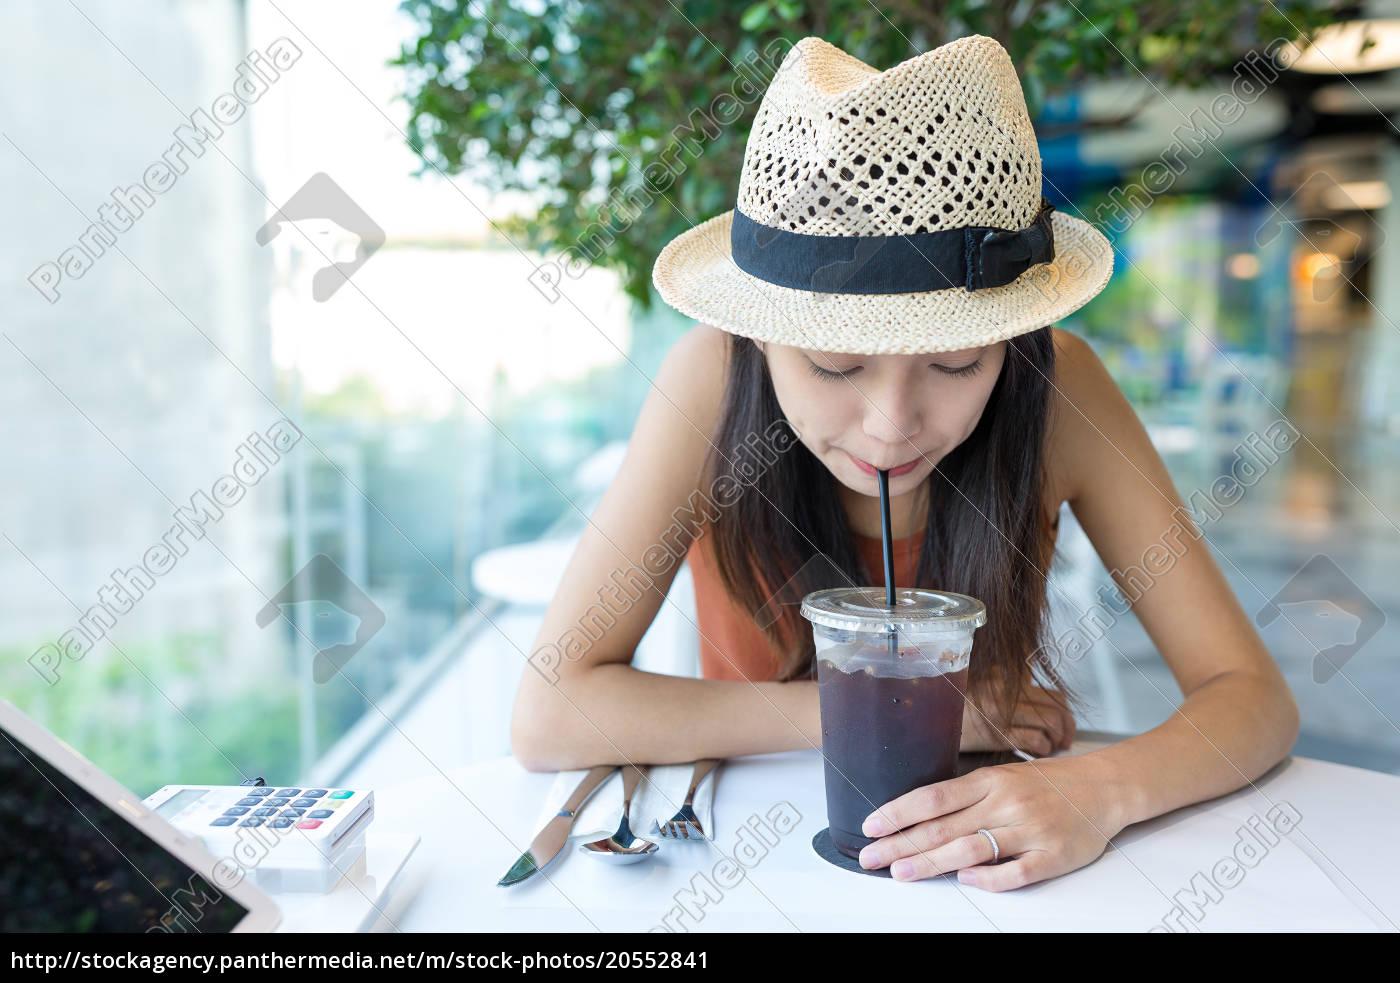 woman, enjoy, coffee, in, cafe - 20552841